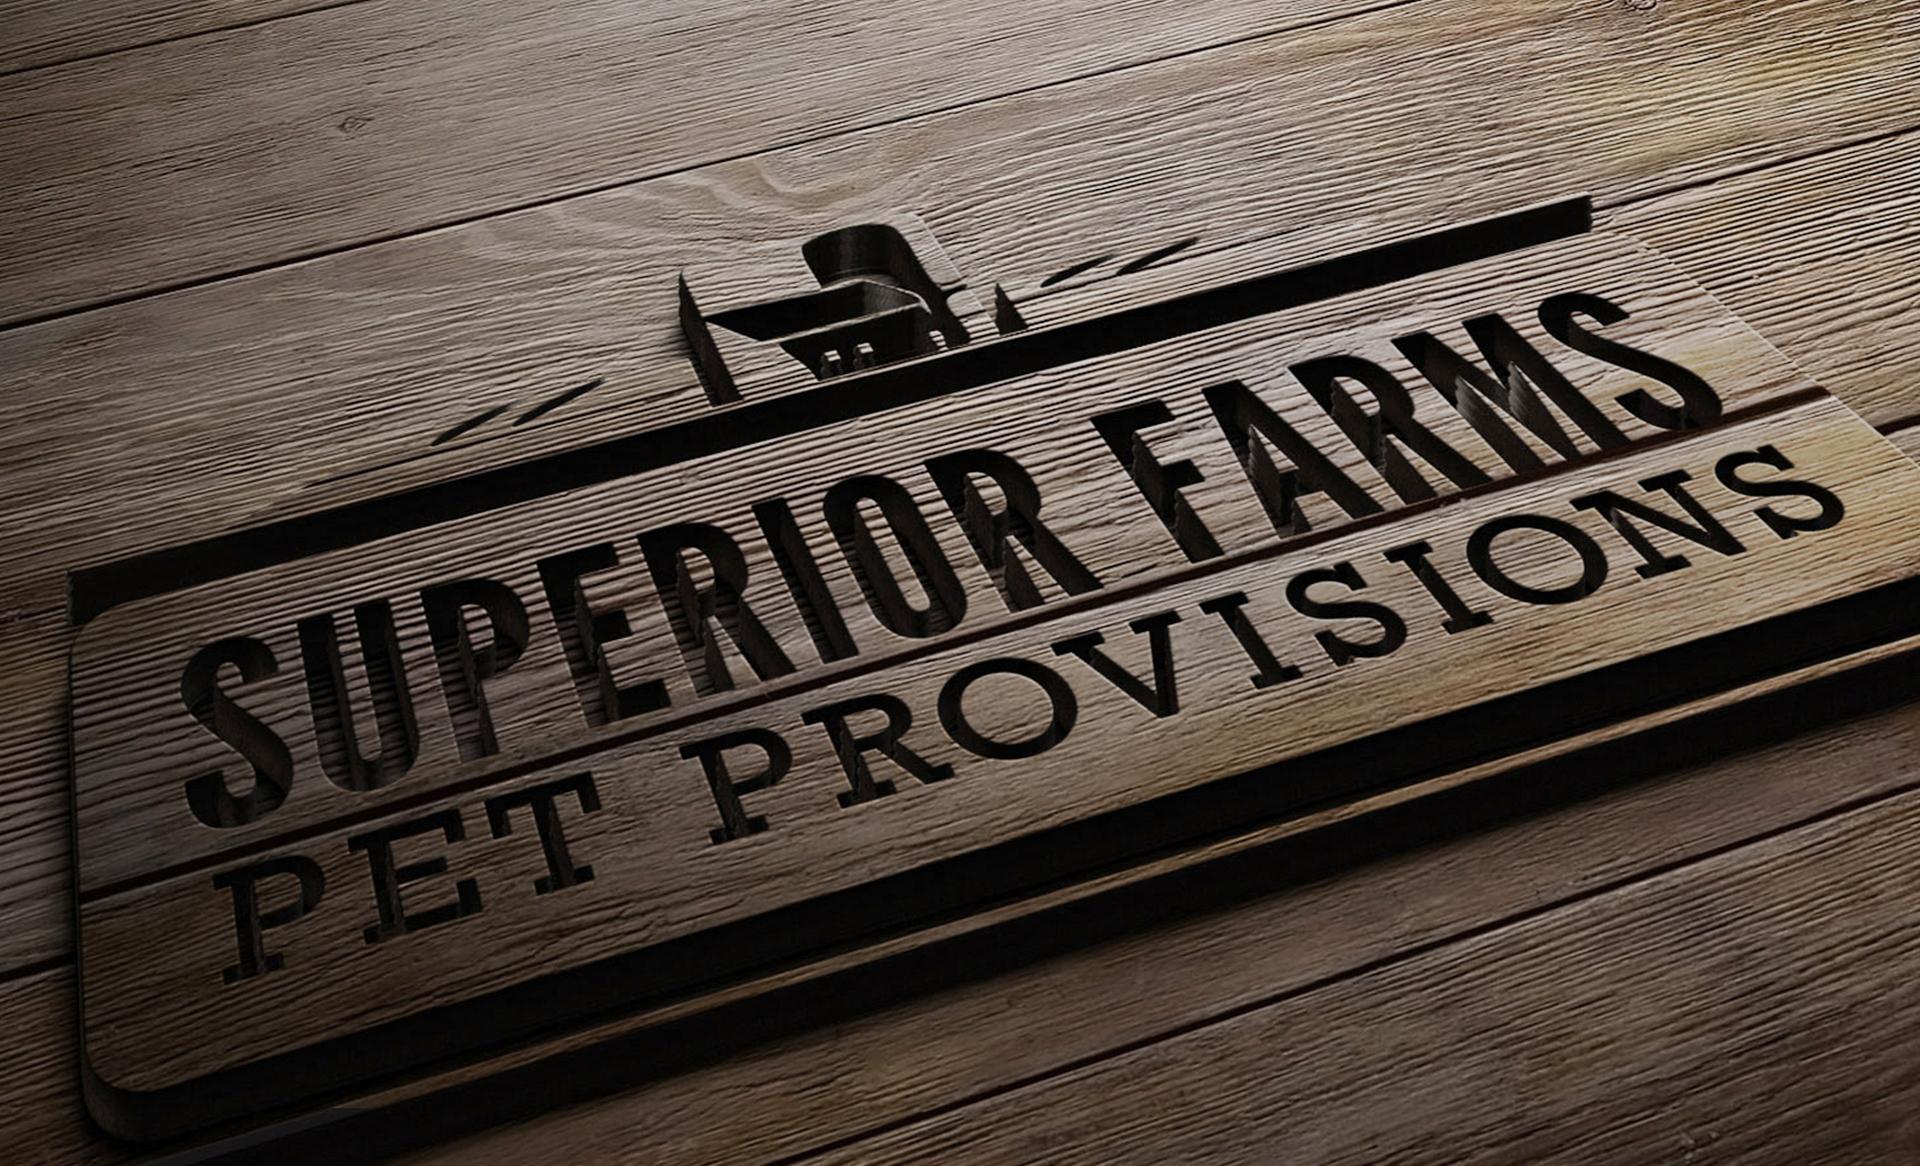 Superior Farms branding